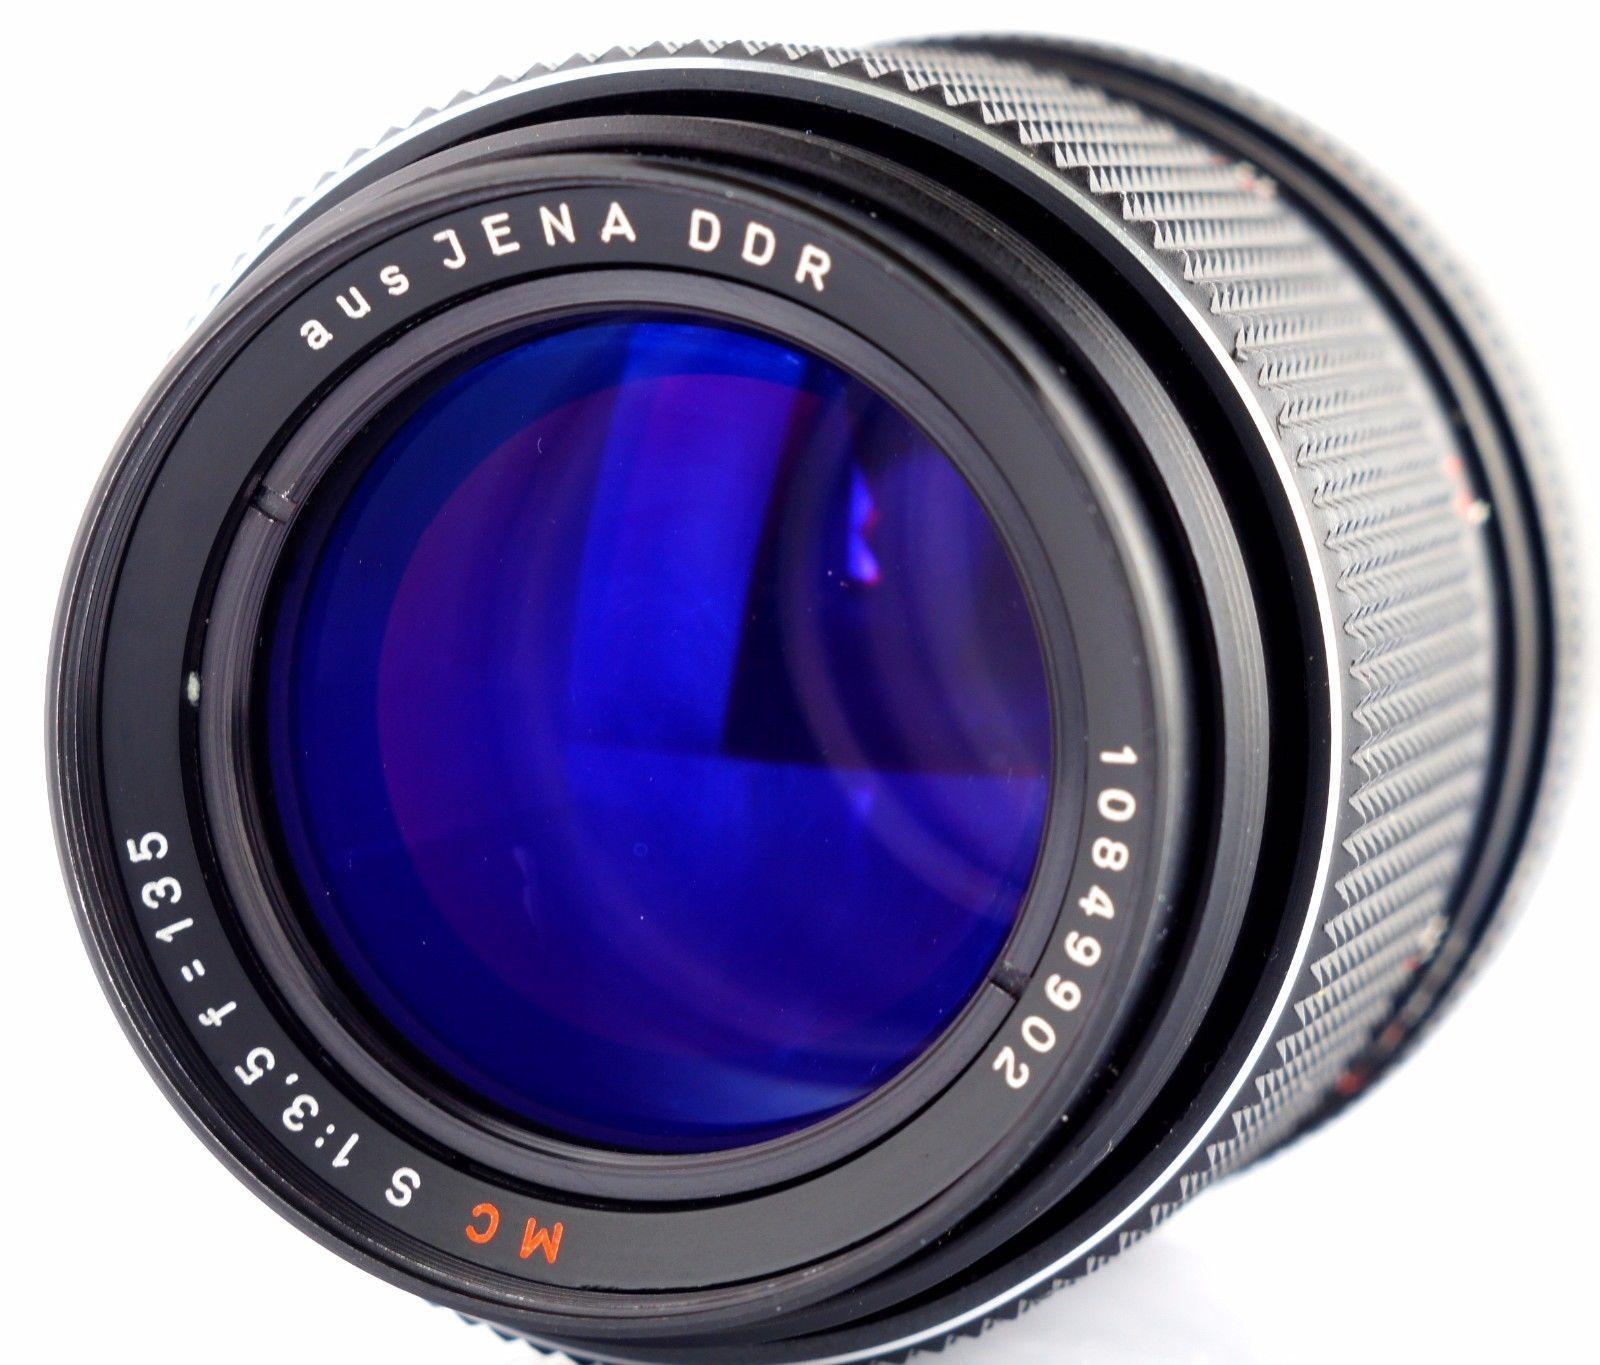 Carl Zeiss ausJena DDR MC Sonnar 3,5/135mm 3 5/135mm No